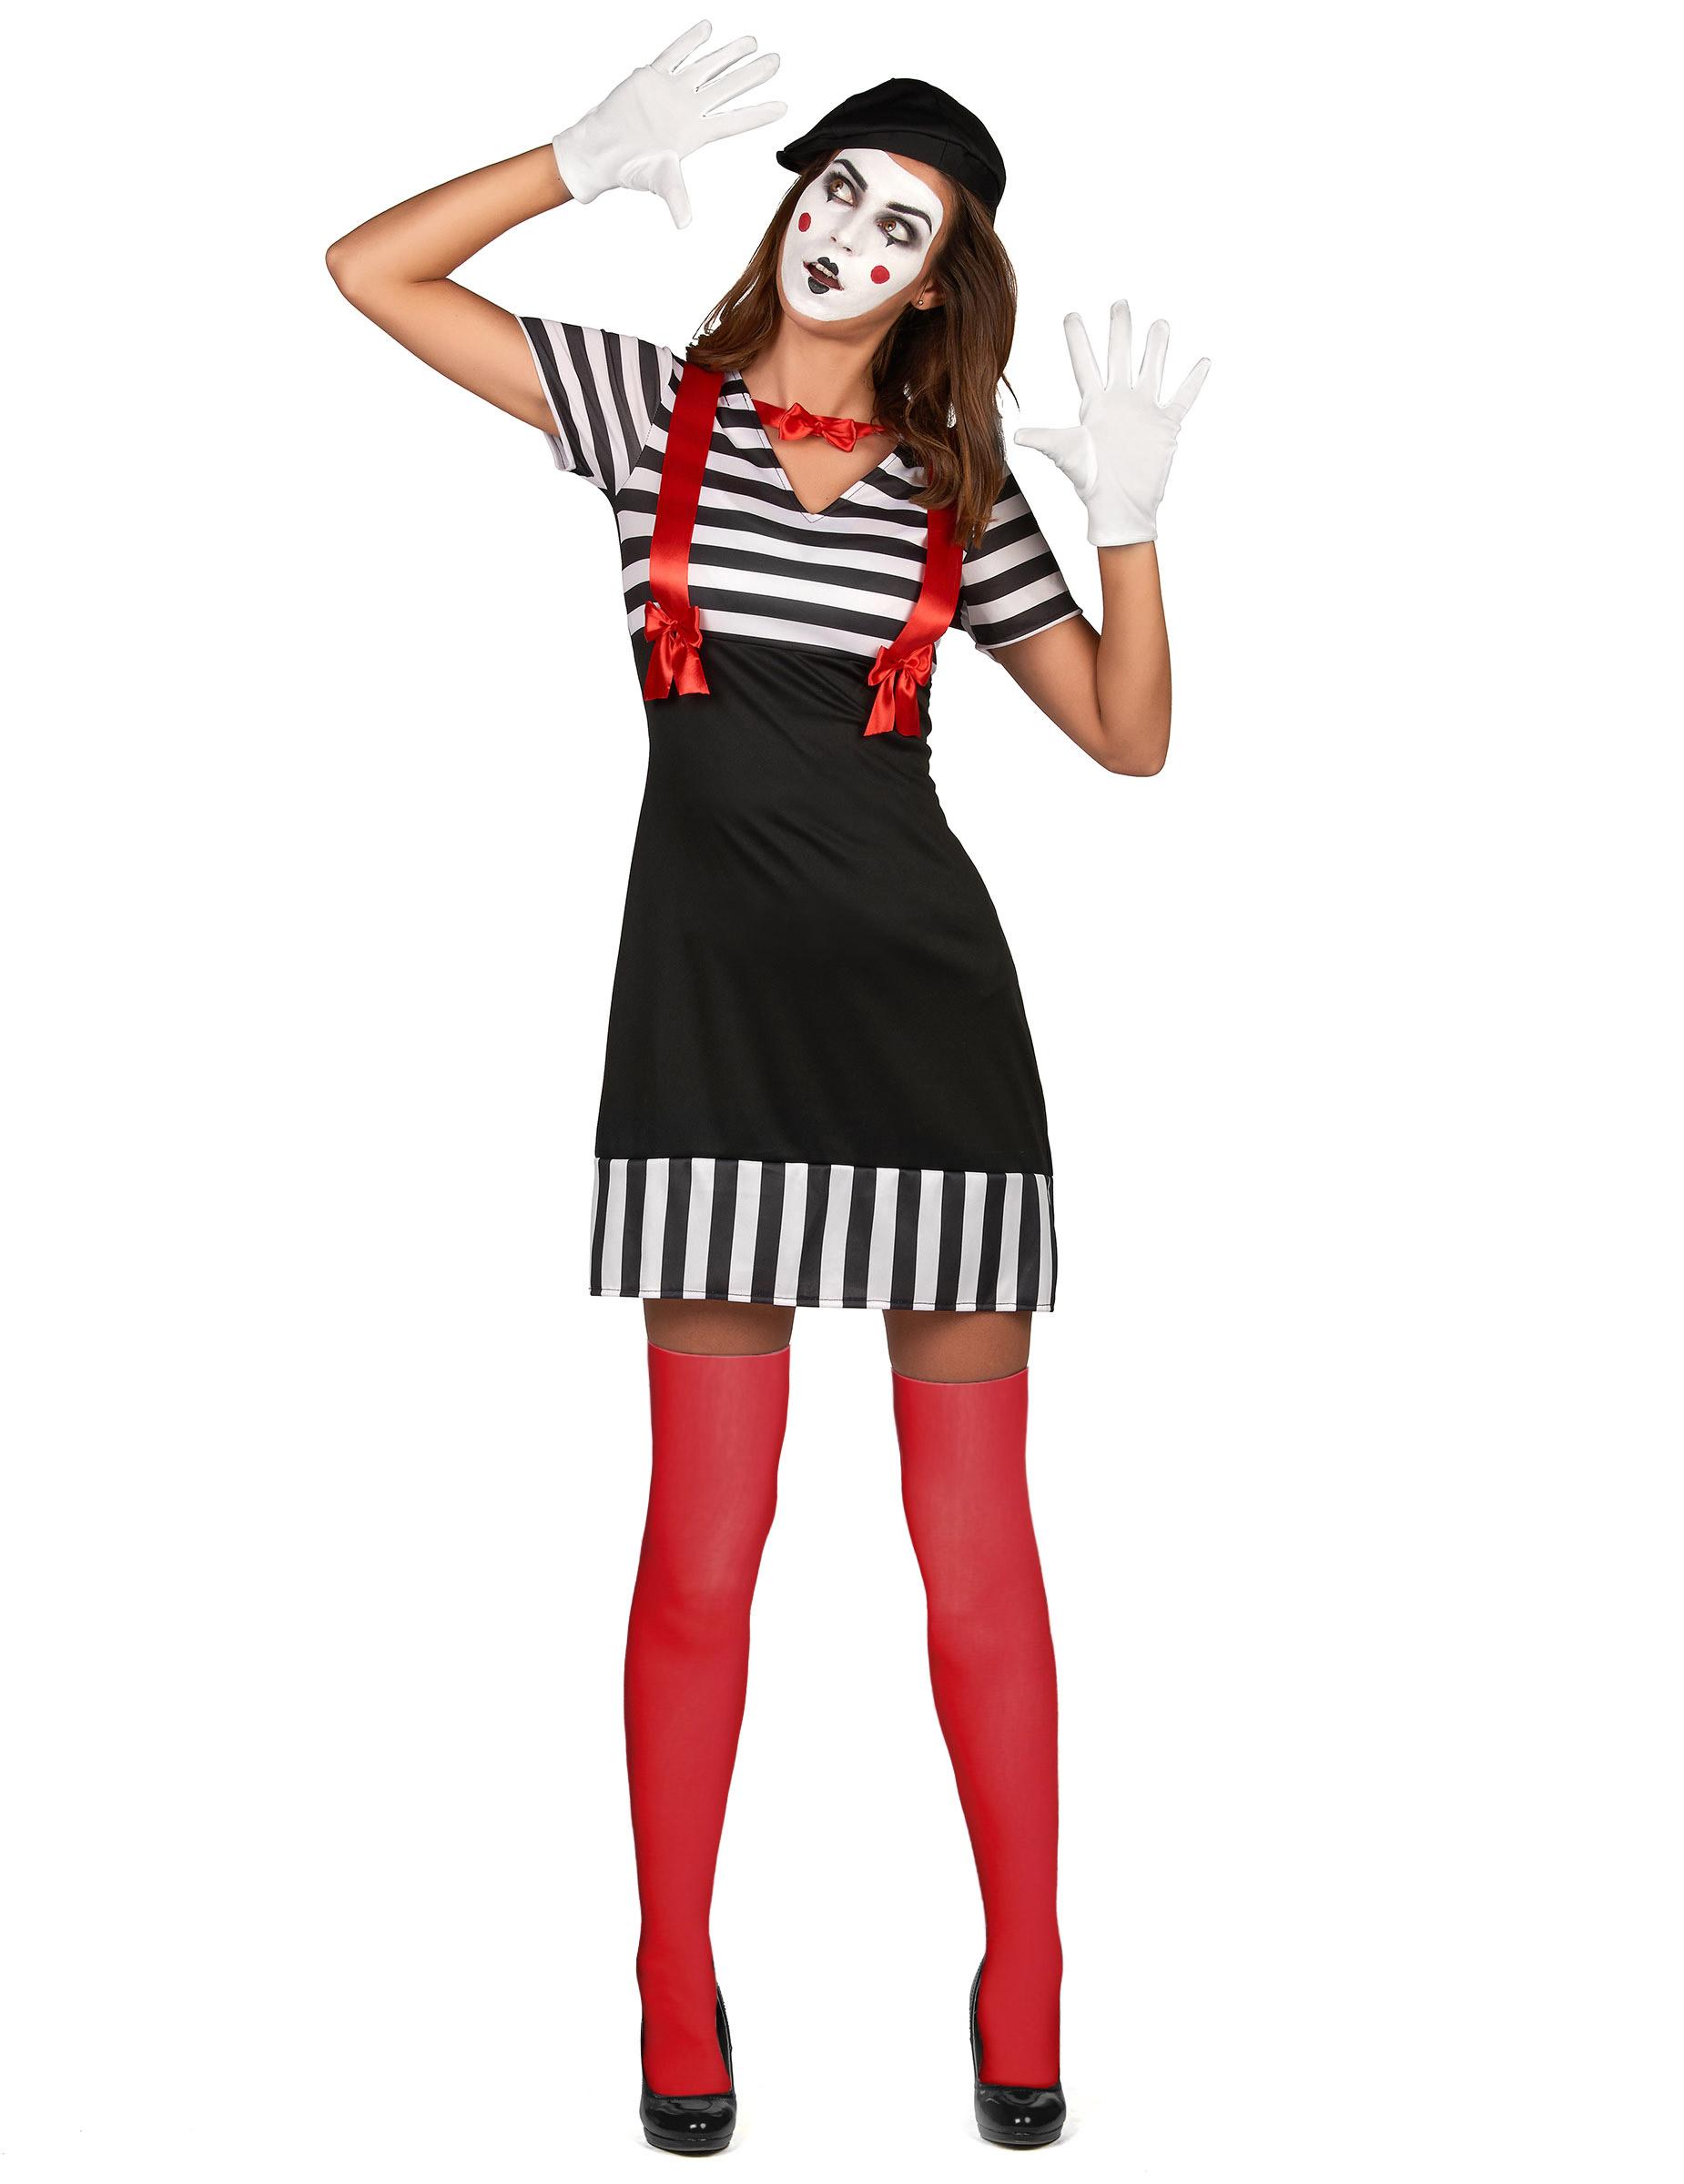 pantomime kost m f r damen karnevalskost m schwarz weiss rot g nstige faschings kost me bei. Black Bedroom Furniture Sets. Home Design Ideas